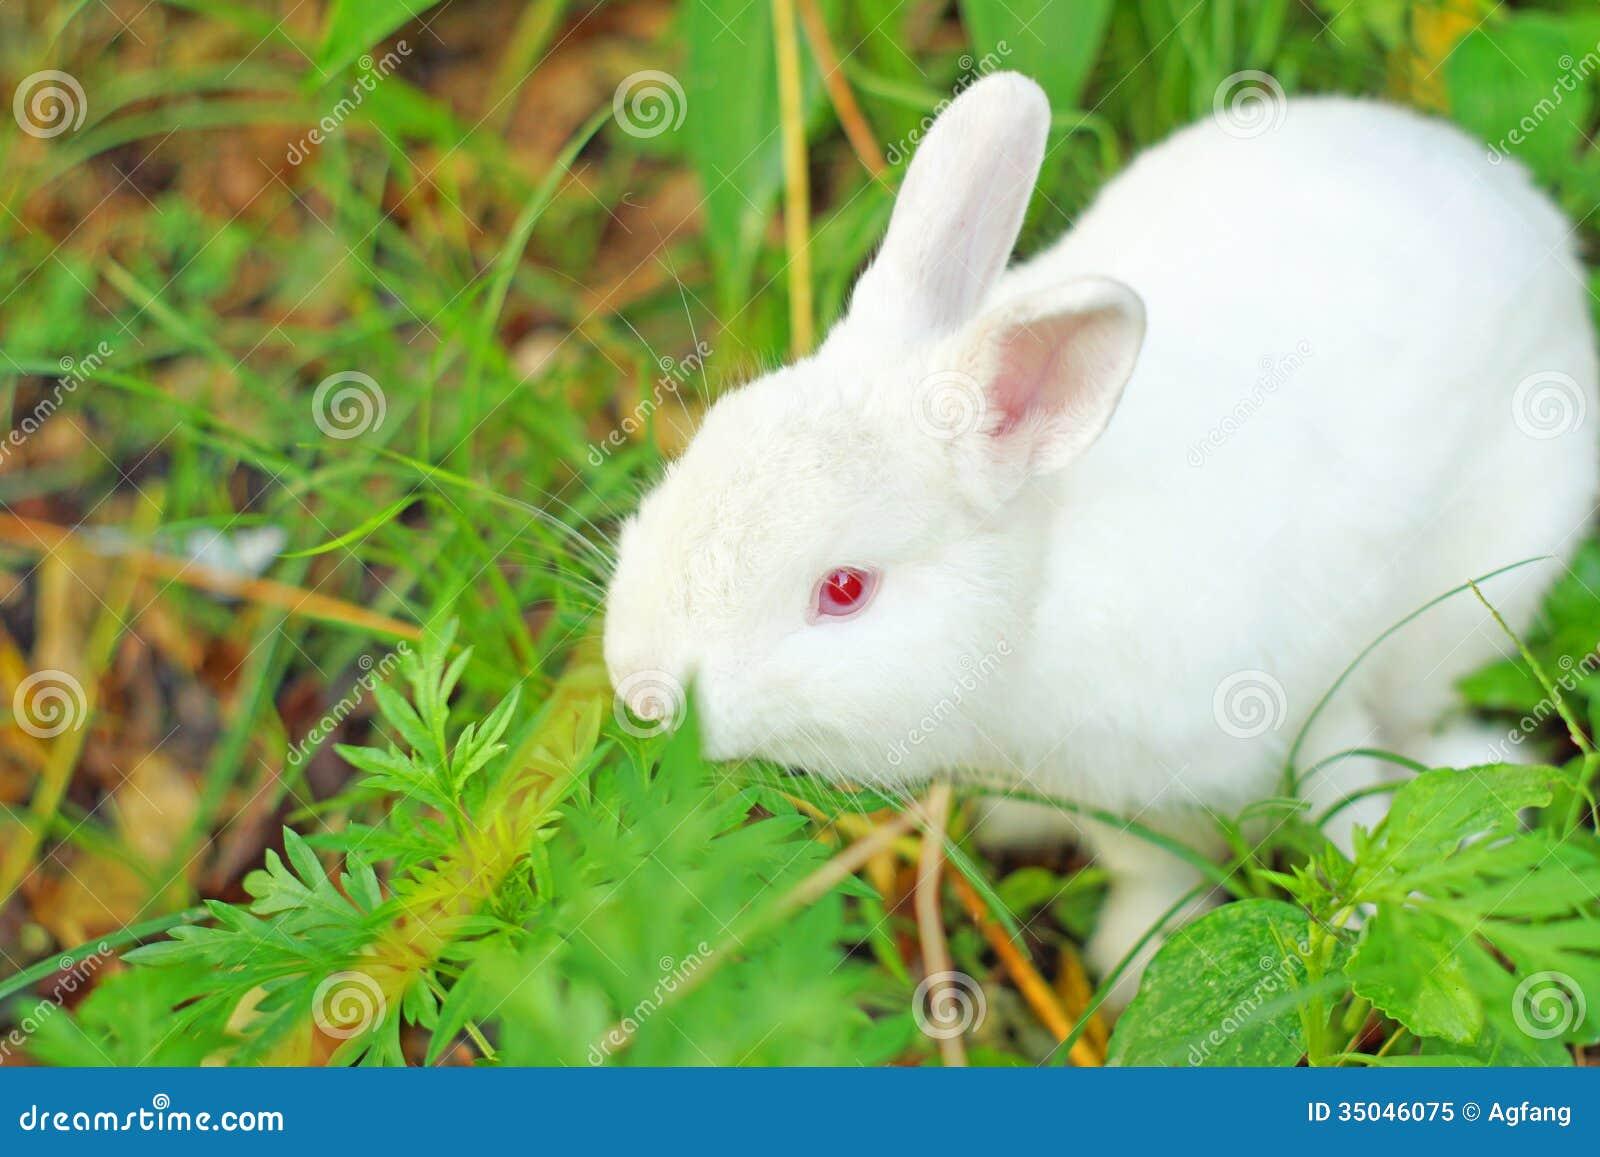 Cute white rabbit images cute white rabbit images photo19 voltagebd Choice Image